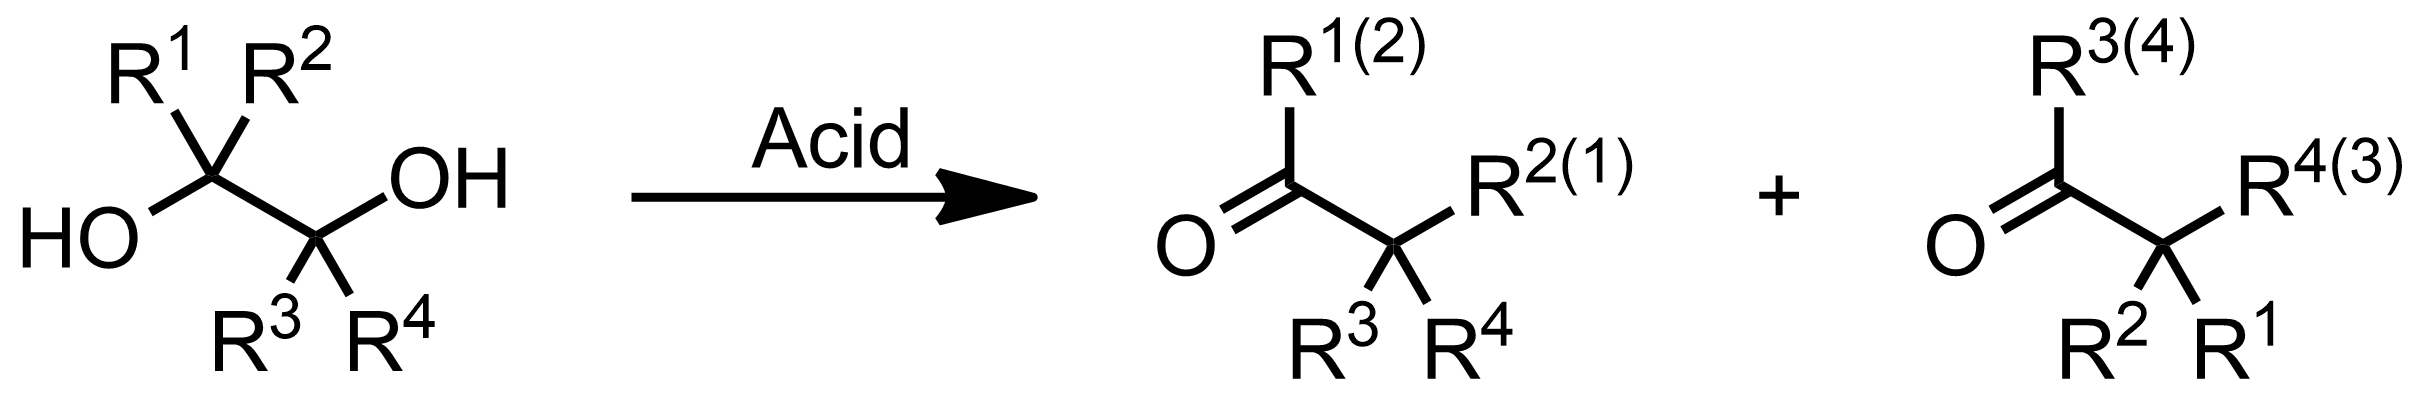 Schematic representation of the Pinacol Rearrangement.